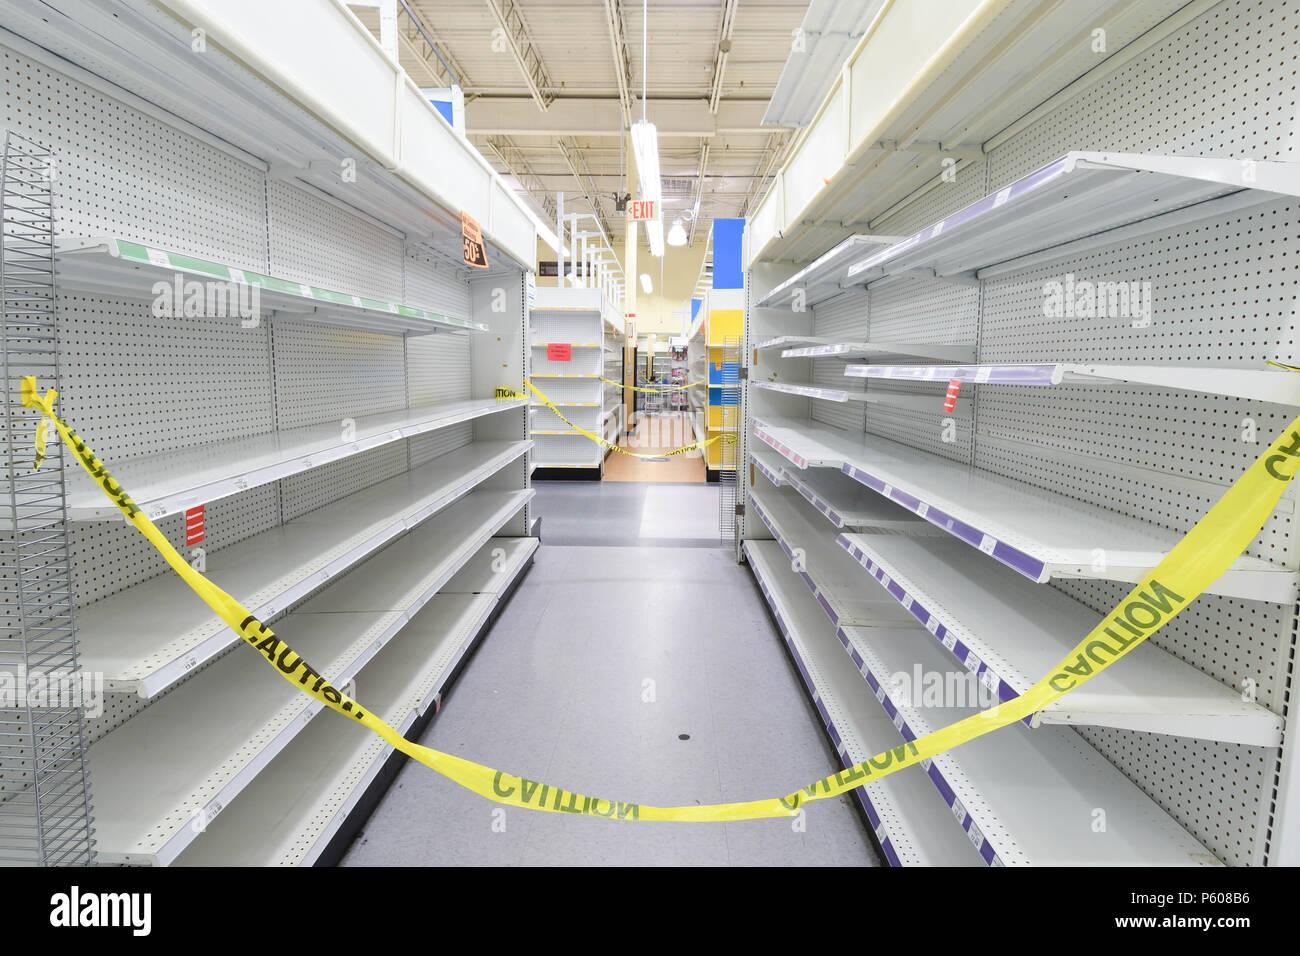 Toy Shelves Stockfotos & Toy Shelves Bilder - Alamy